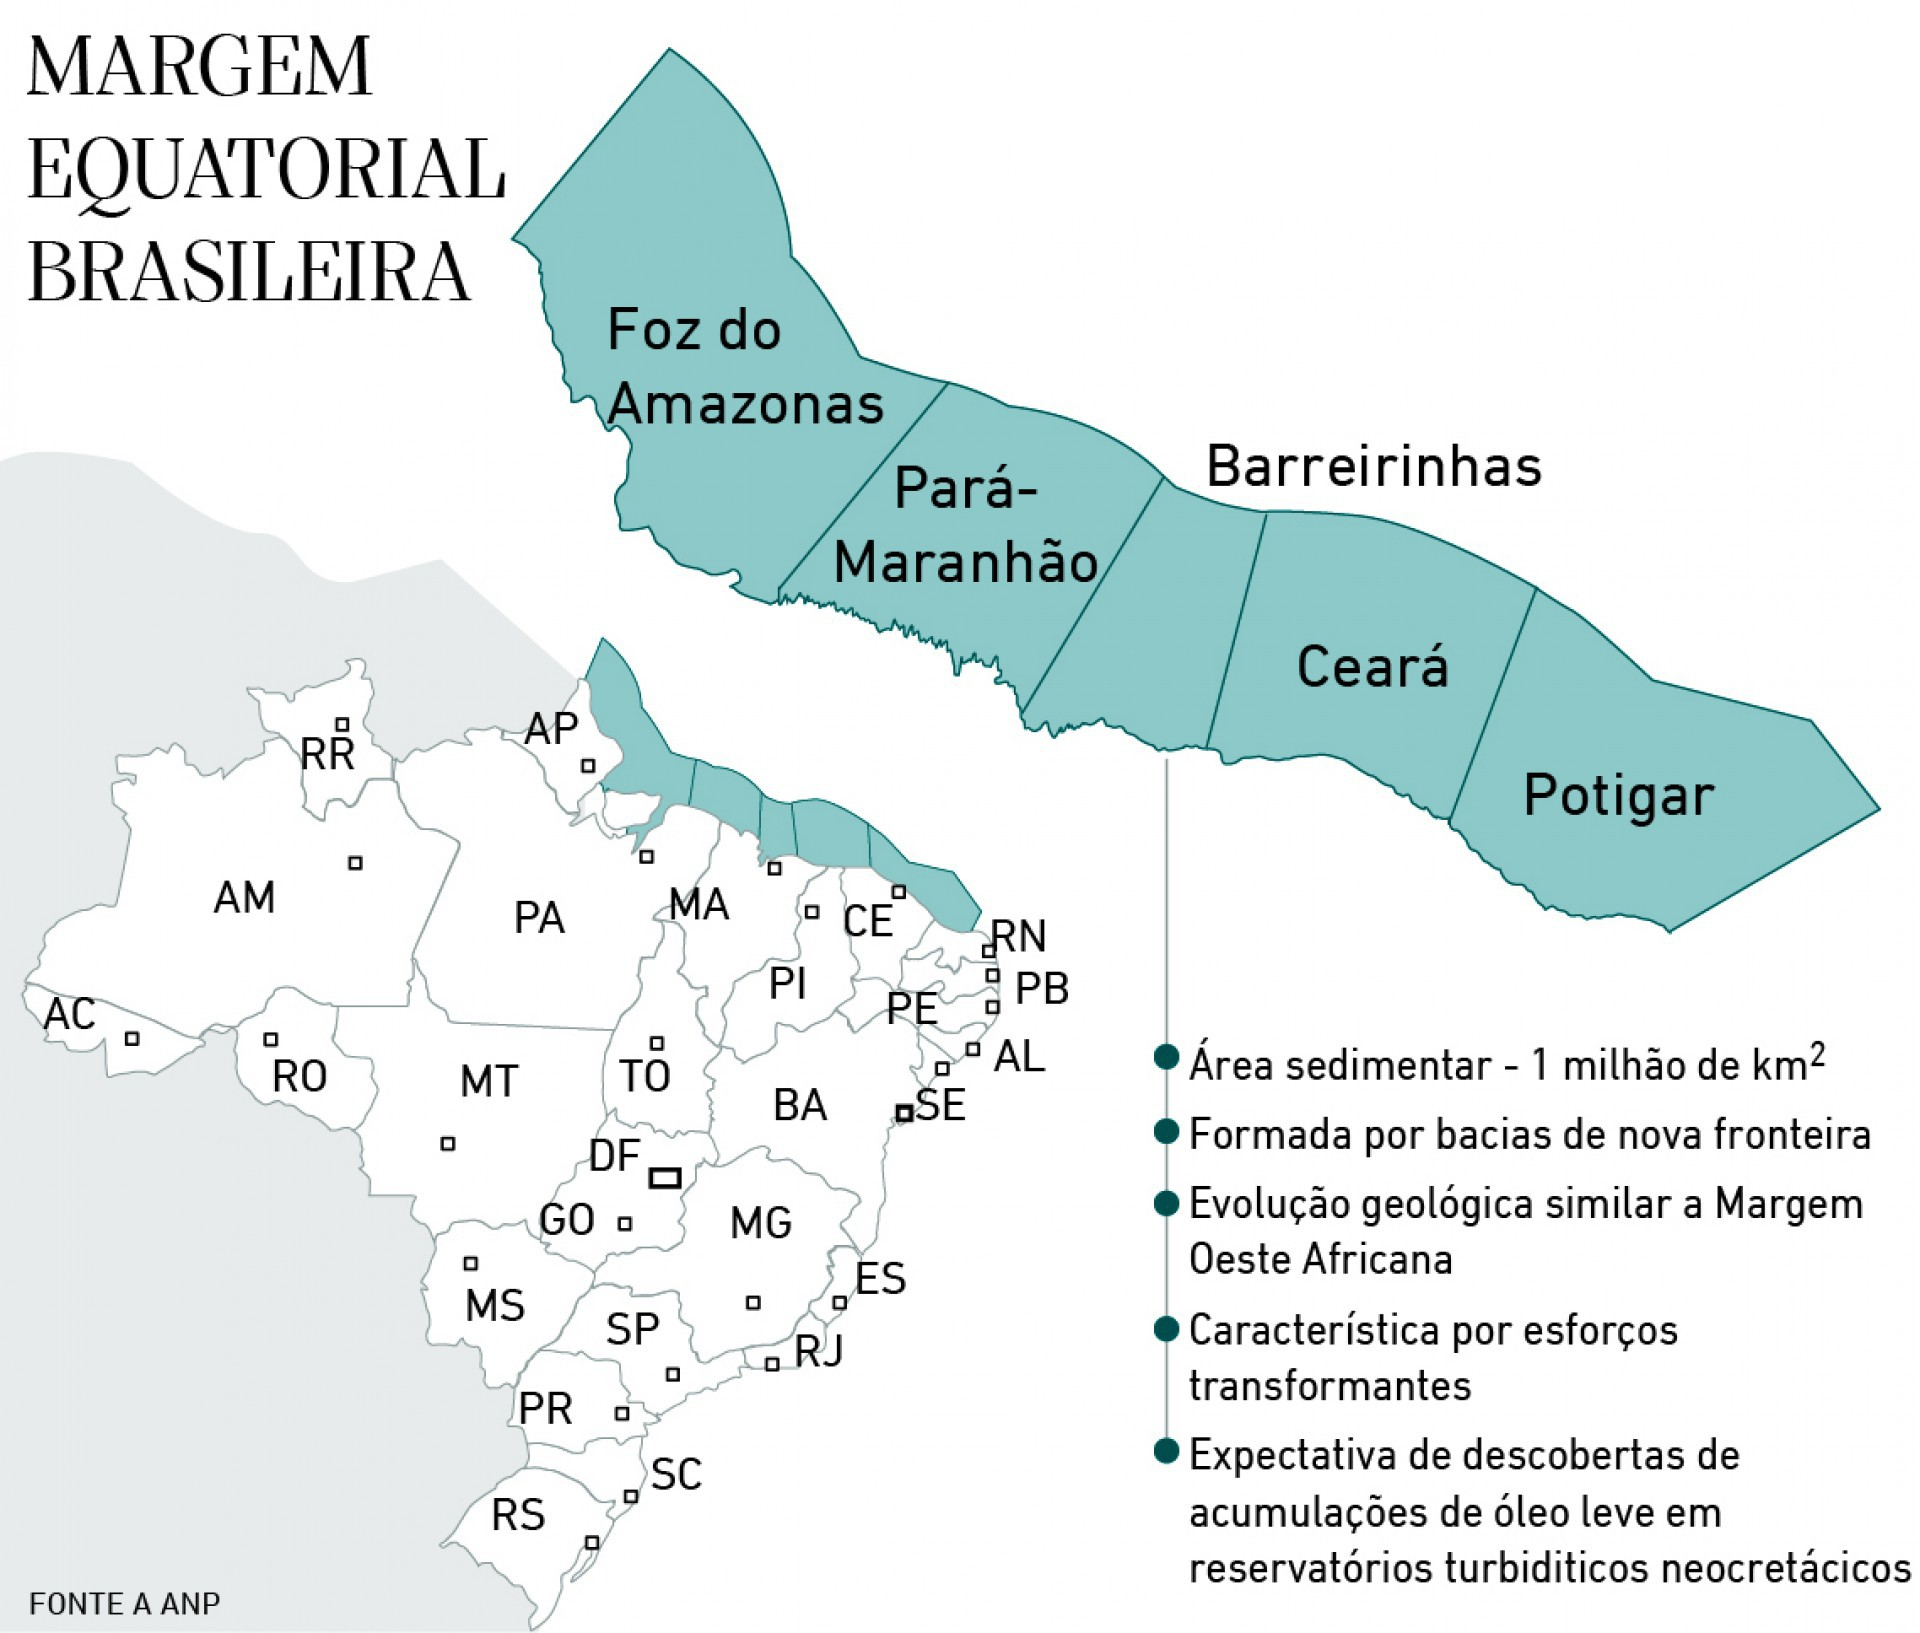 Margem equatorial brasileira